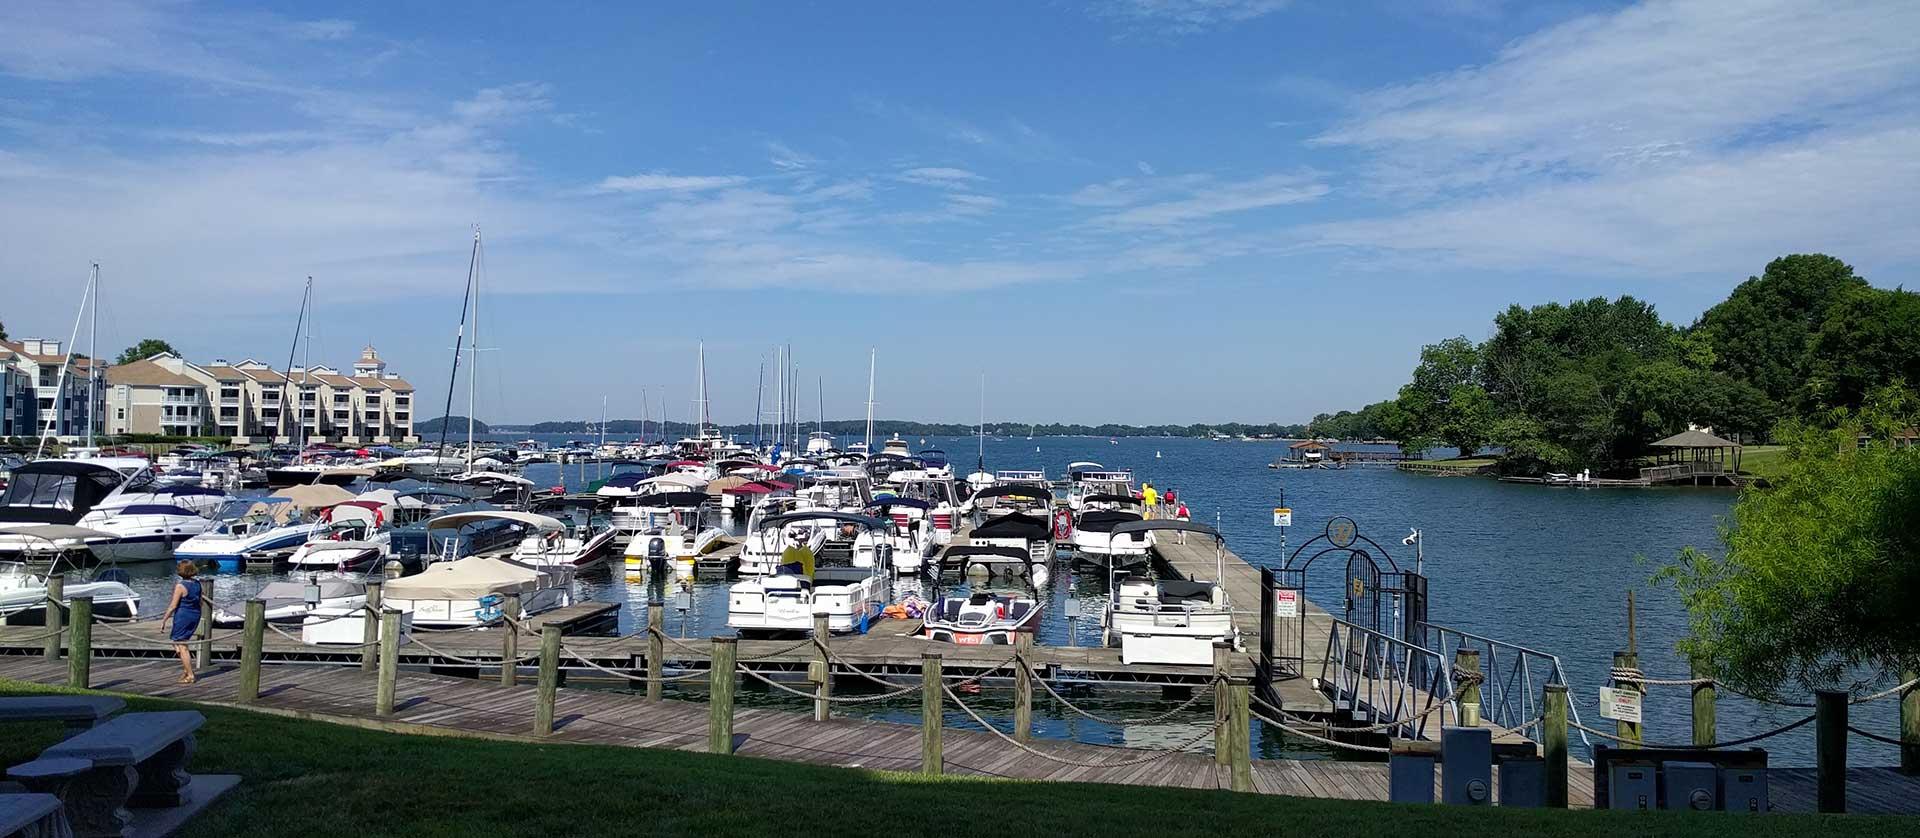 Freedom Boat Club  Lake Norman  Resort Cams